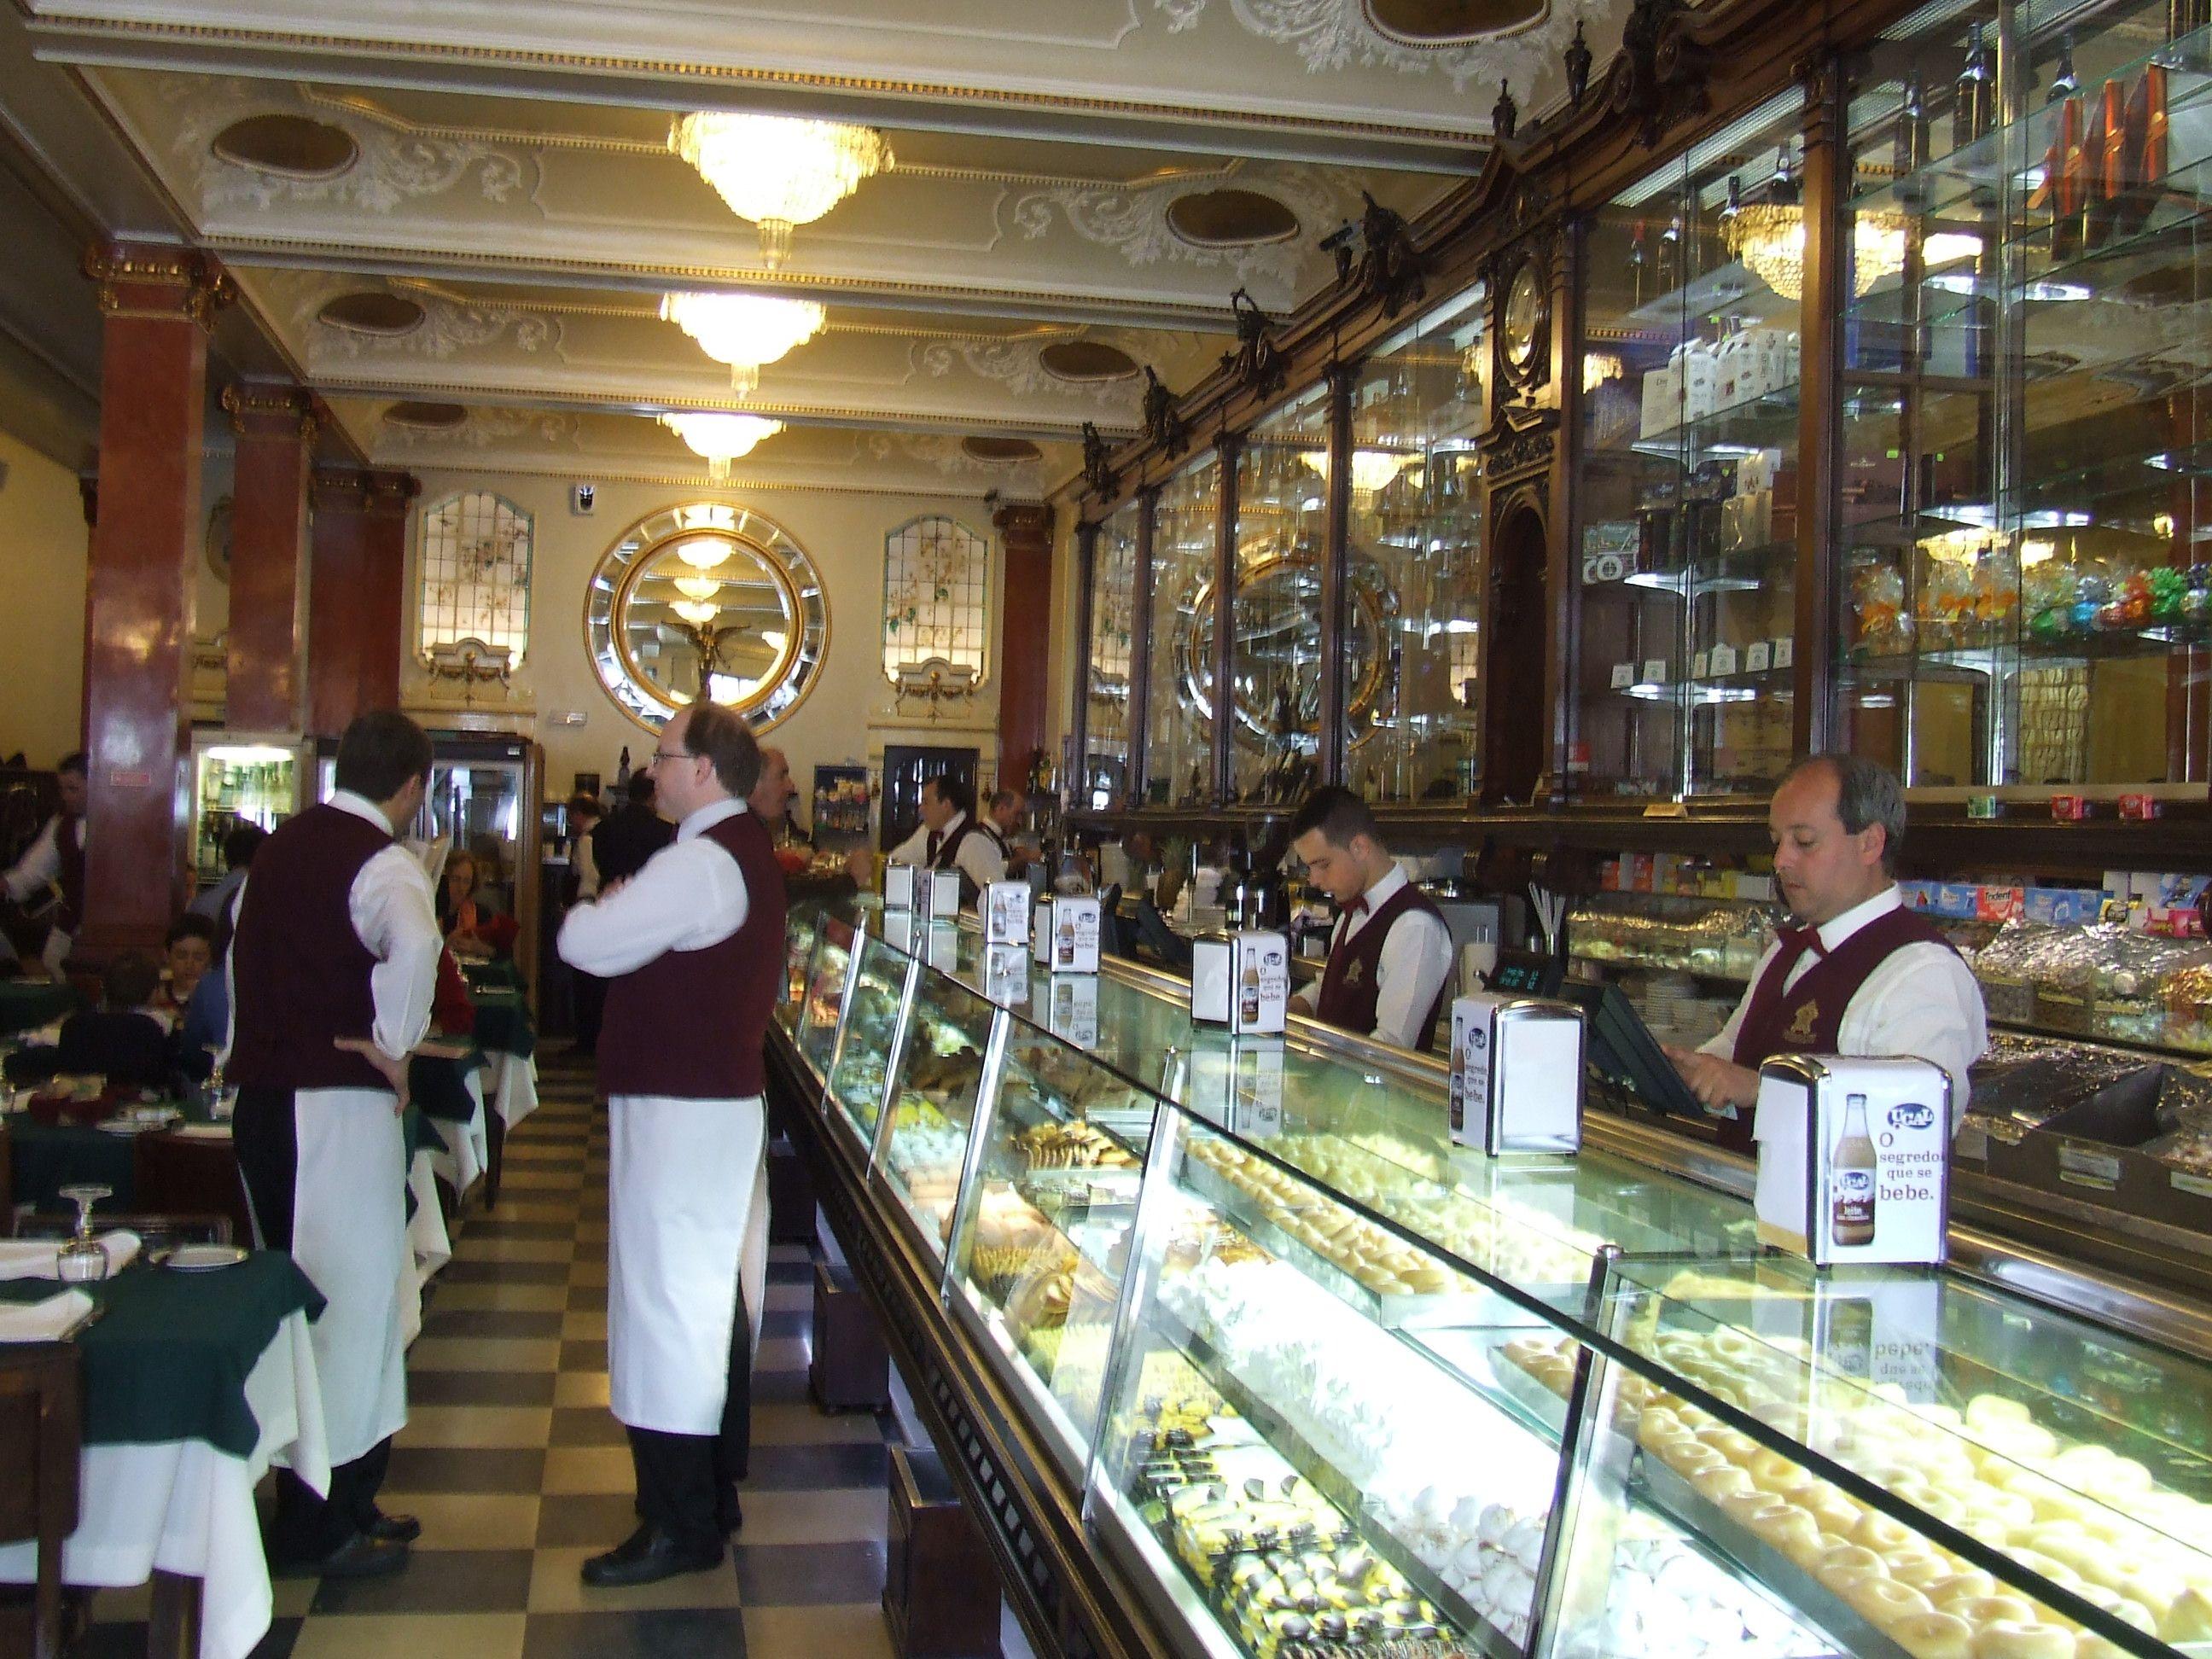 [Pastelaria Versailles] http://cafeteriaportuguesa.blogspot.pt/